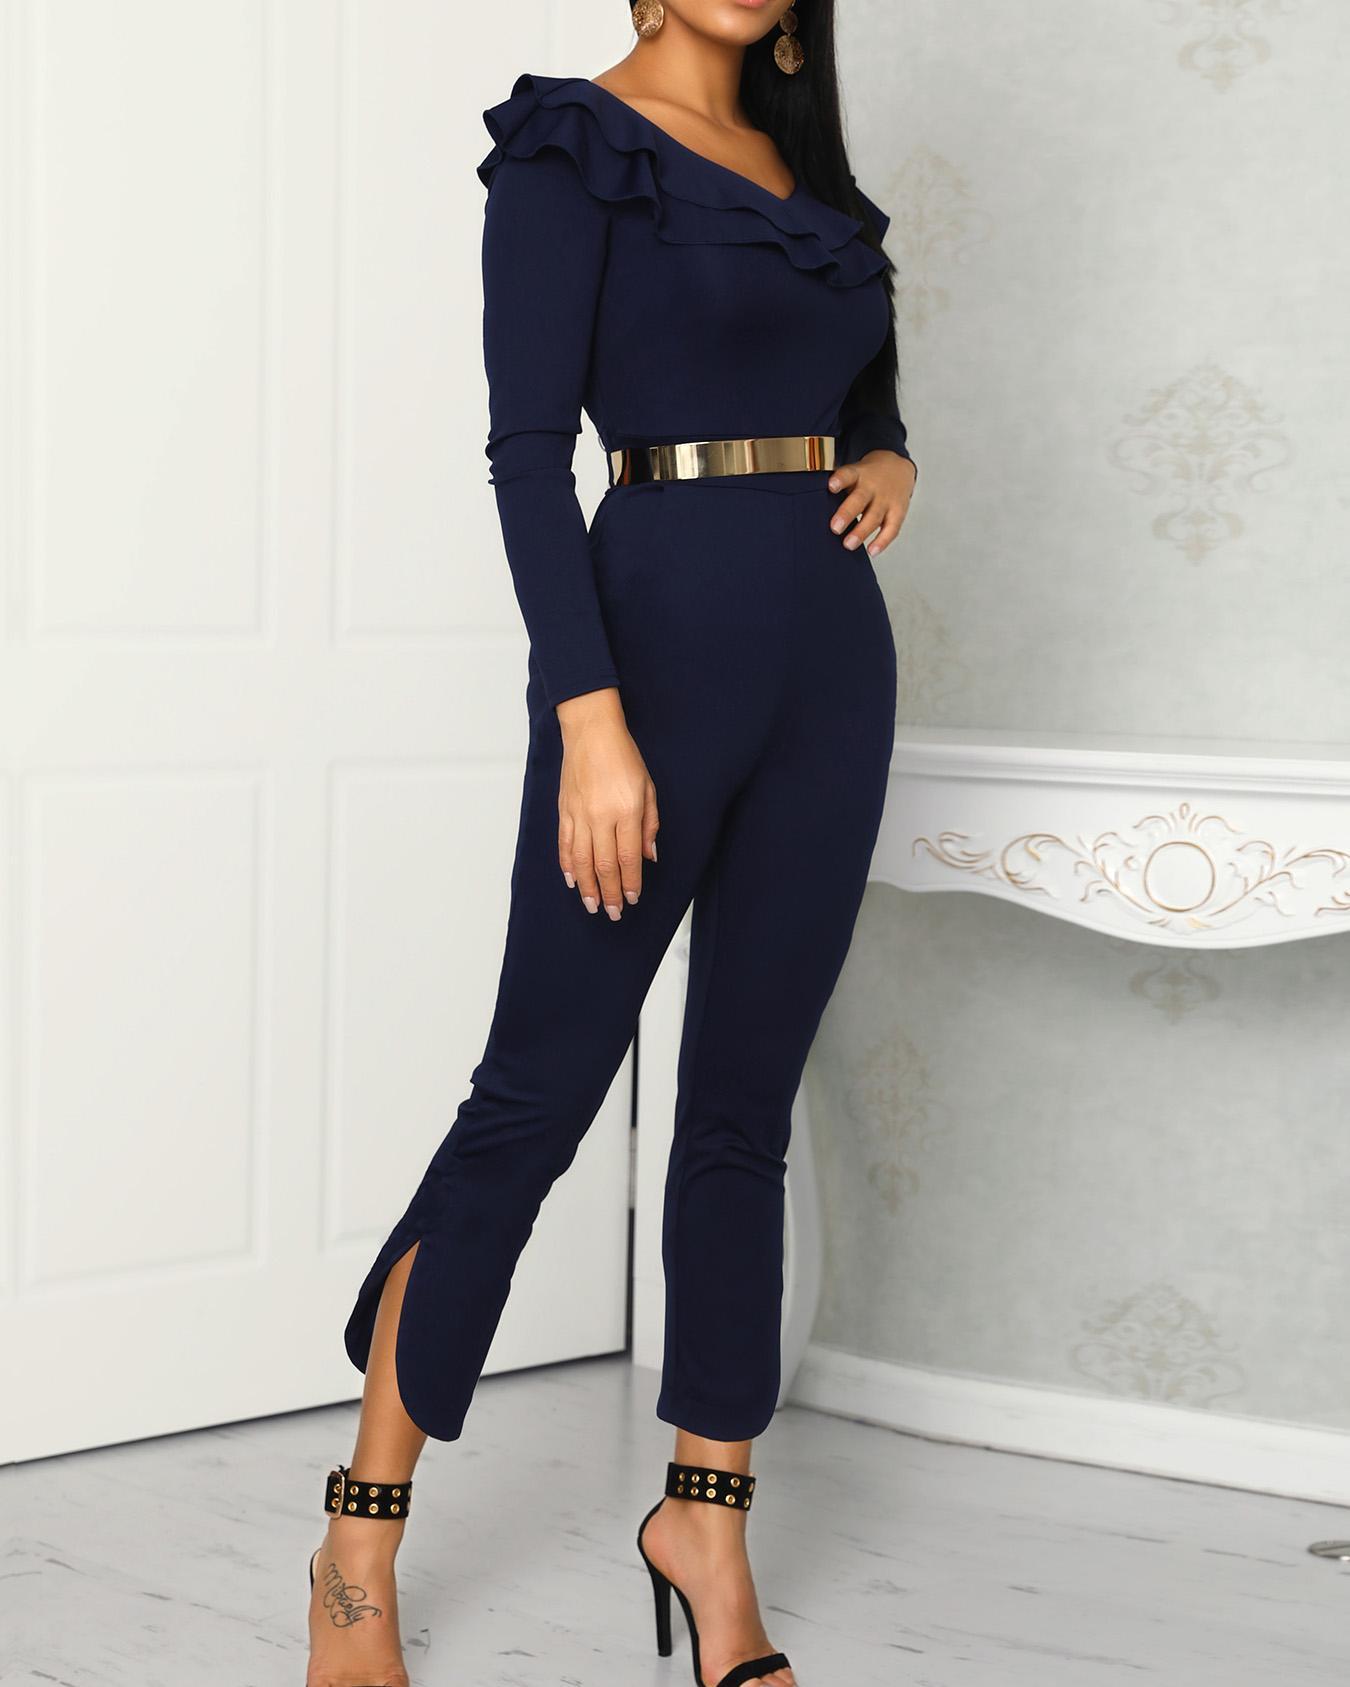 boutiquefeel / Laminado Ruffles Design Slit Hem Petite Jumpsuit